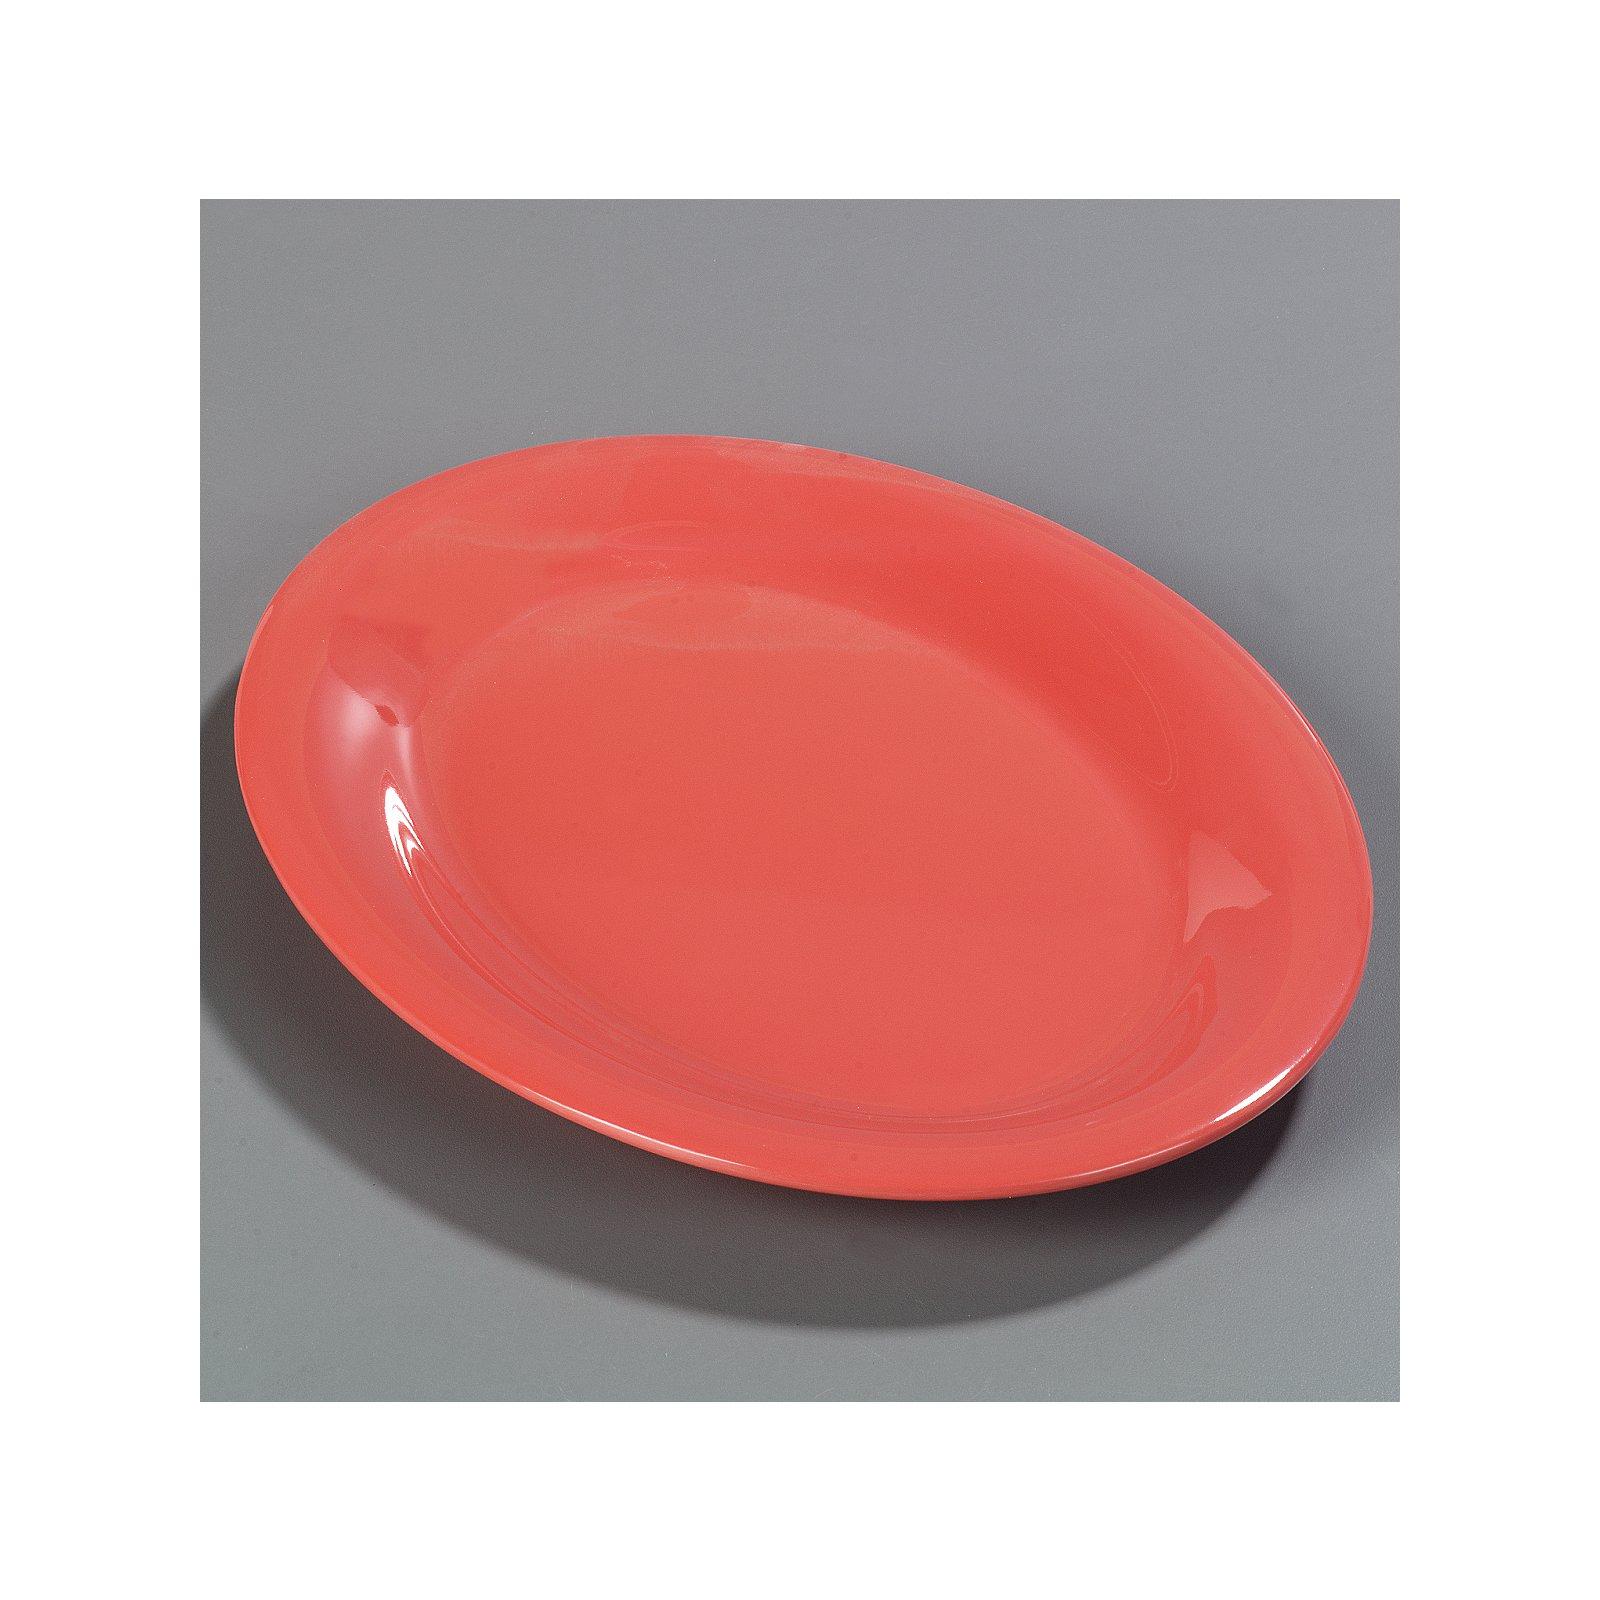 ... 3308252 - Sierrus™ Melamine Oval Platter Tray 12  x 9  - Sunset Orange  sc 1 st  Carlisle FoodService Products & 3308252 - Sierrus™ Melamine Oval Platter Tray 12